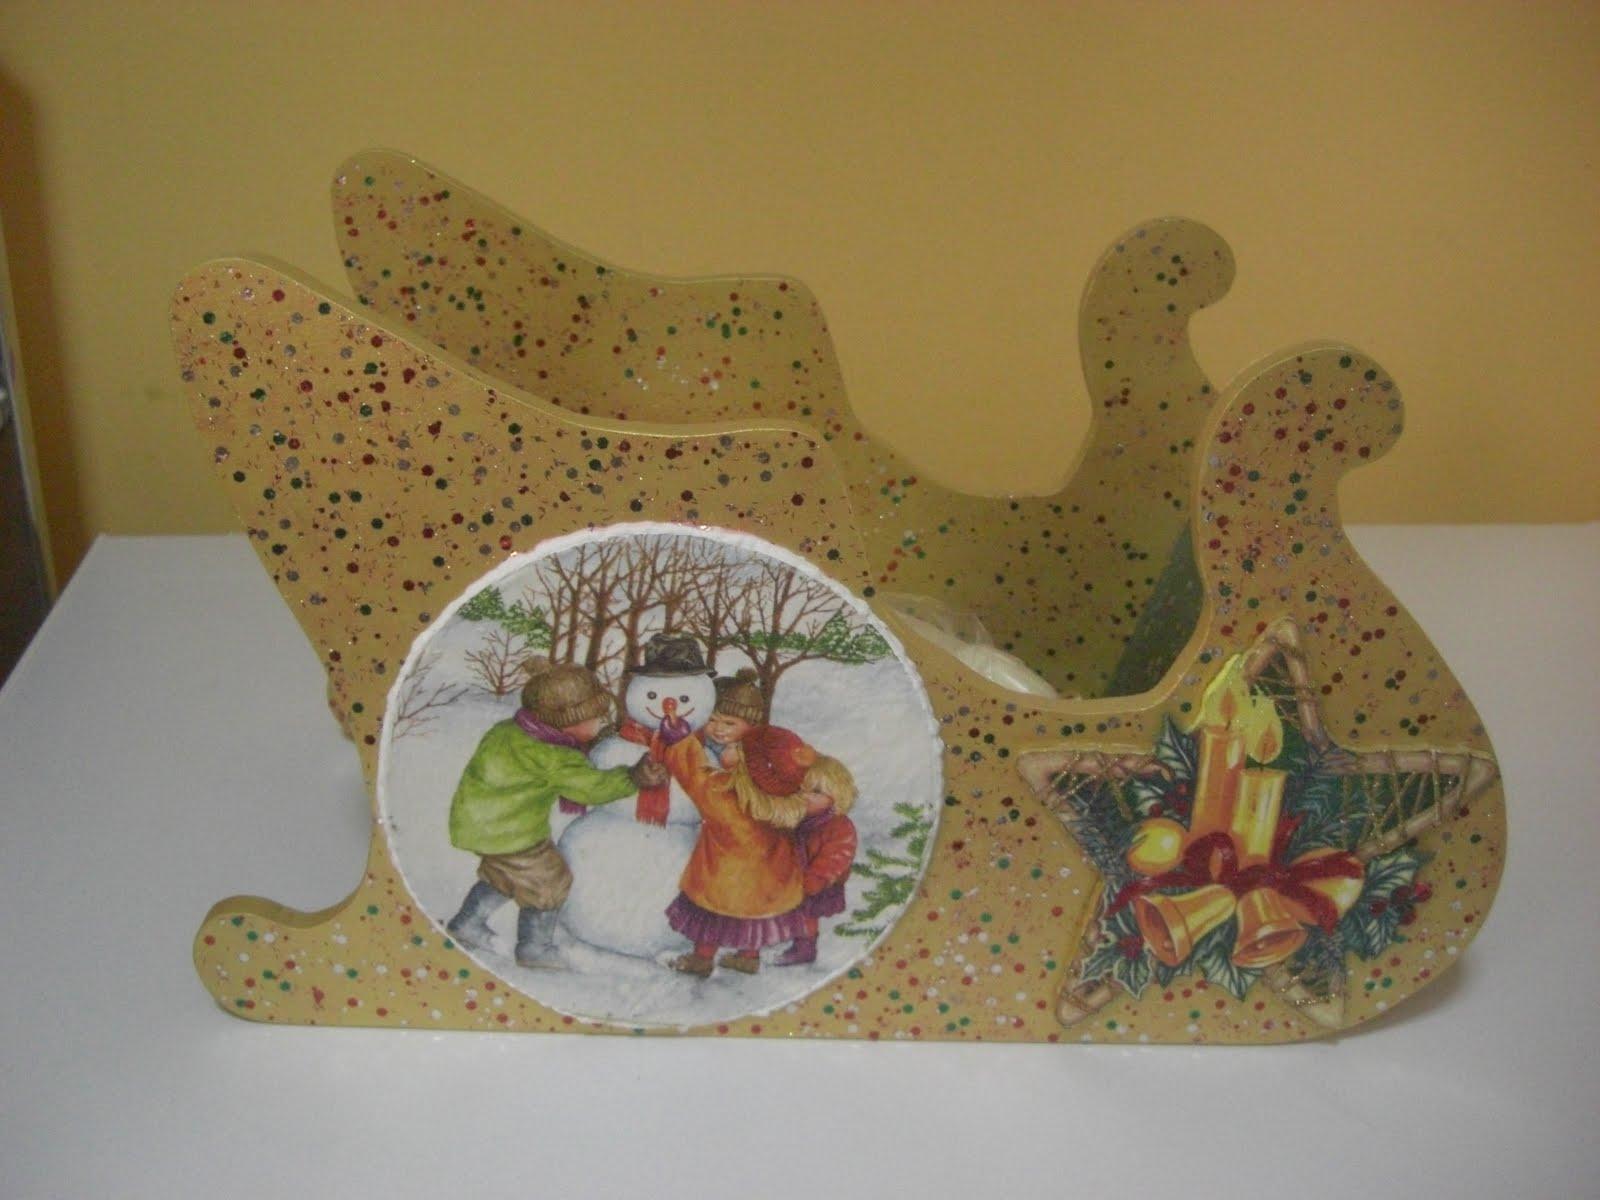 Manos fascinantes detalles para decorar tu casa en navidad - Detalles para decorar la casa ...